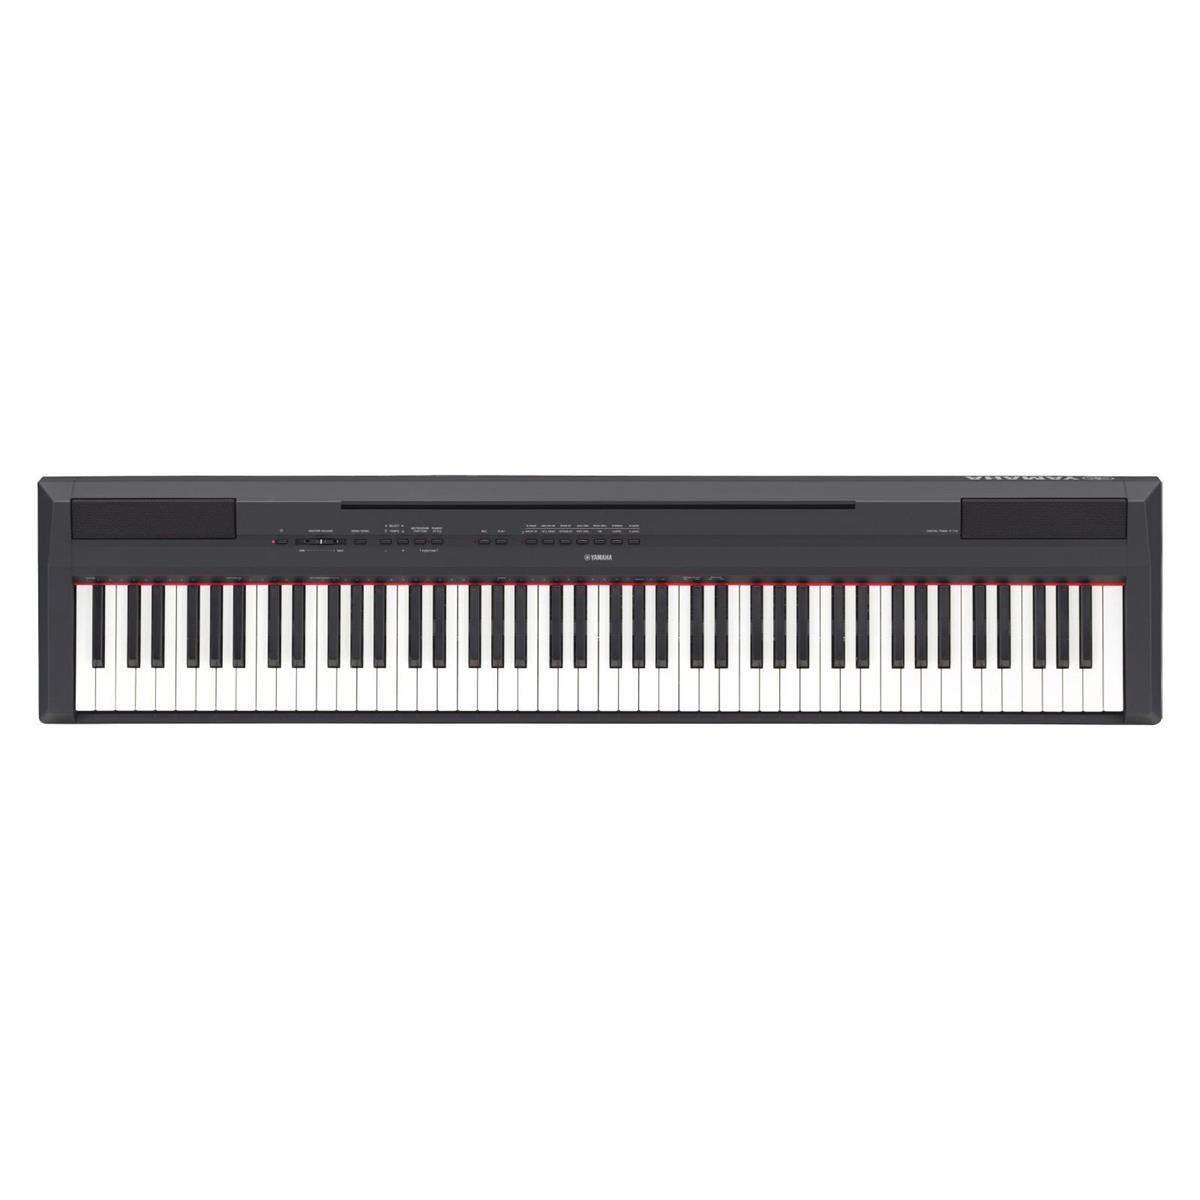 YAMAHA P 115 B STAGE PIANO